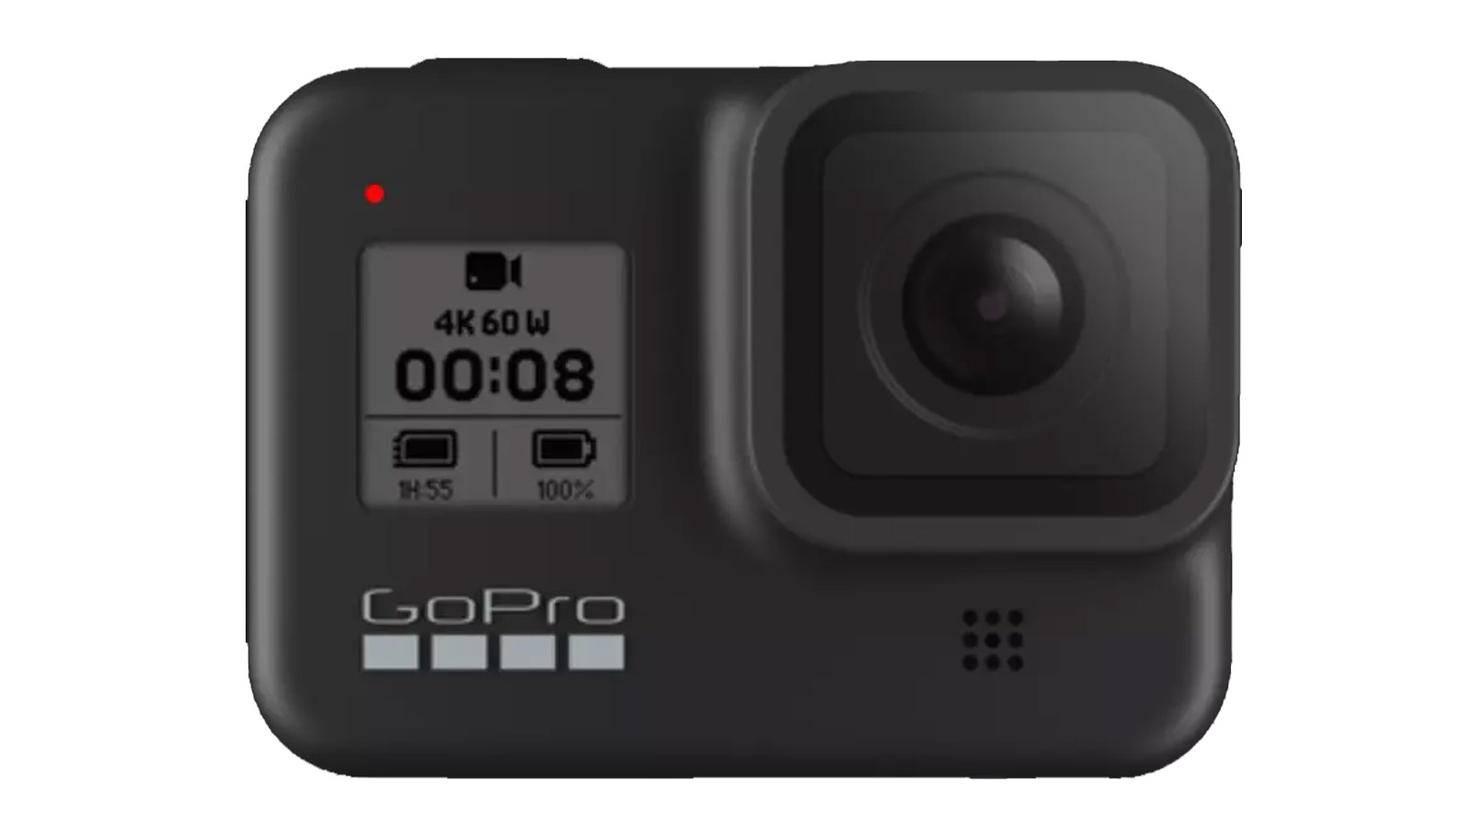 GoPro HERO8 Black Action-Cam